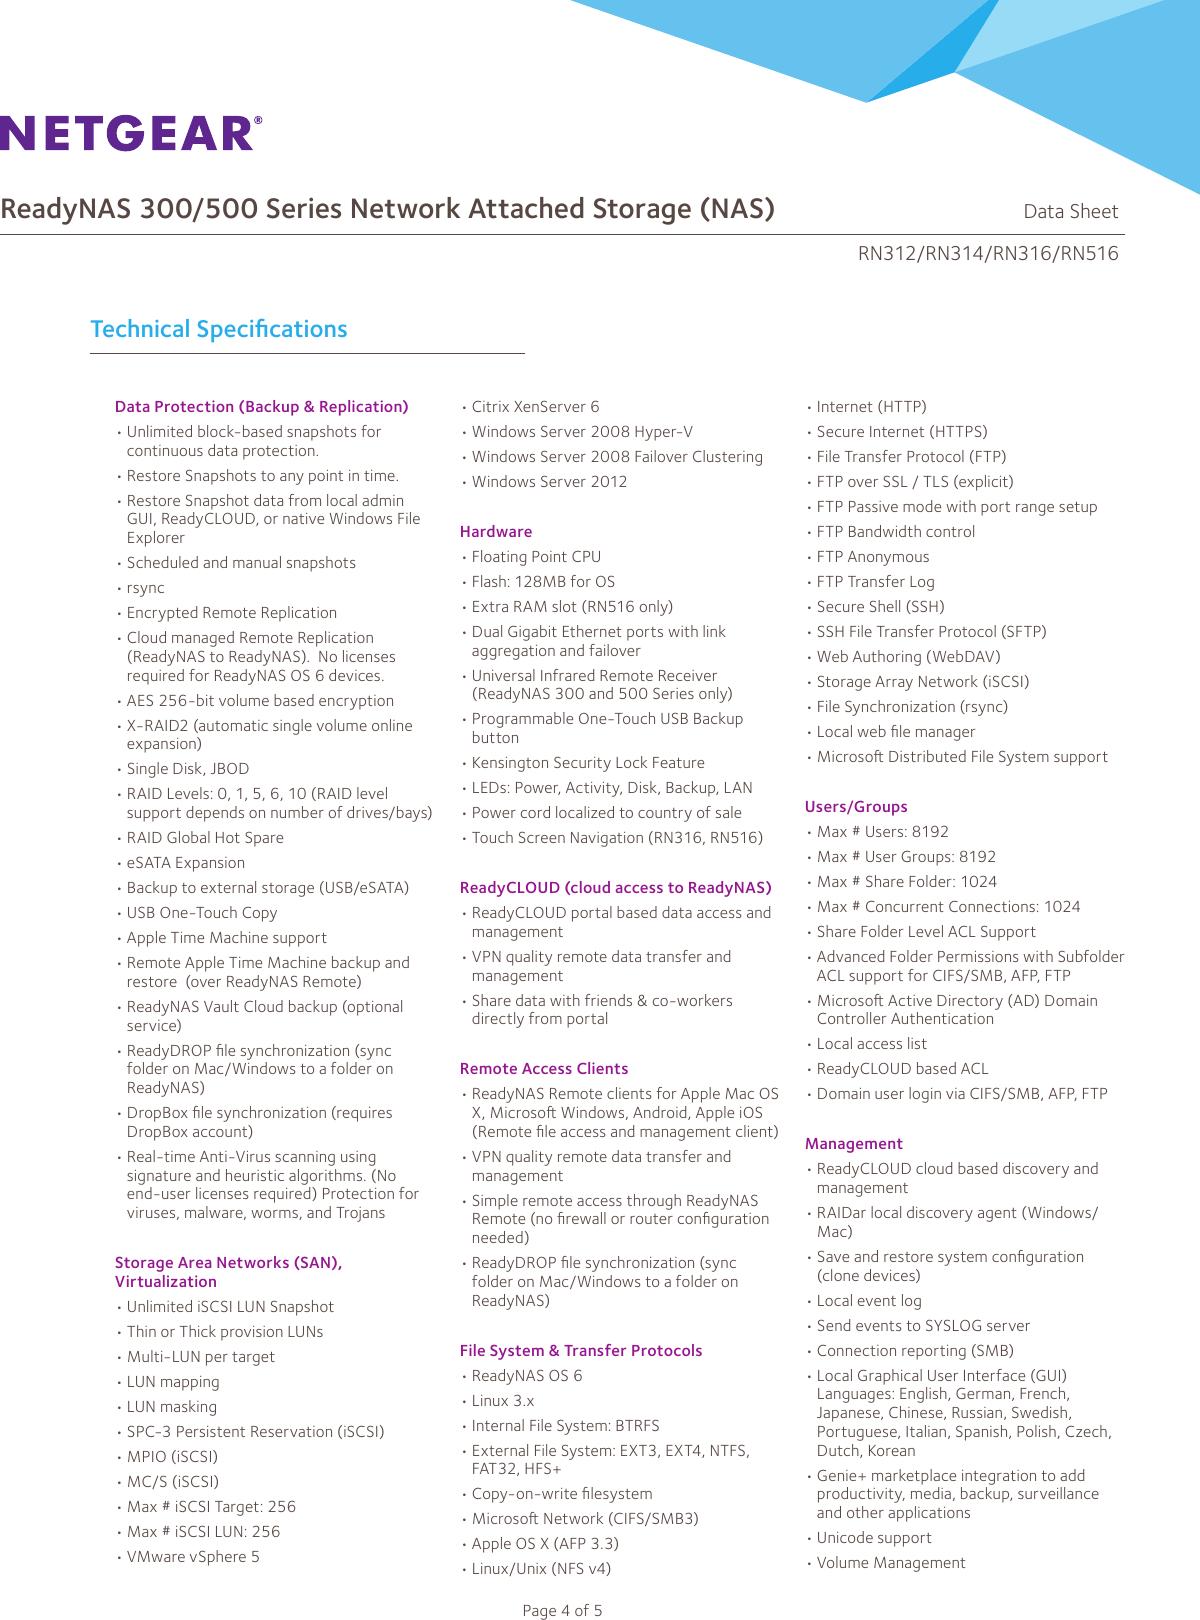 Netgear Readynas 312 Storage Rn31200 100Nas Users Manual